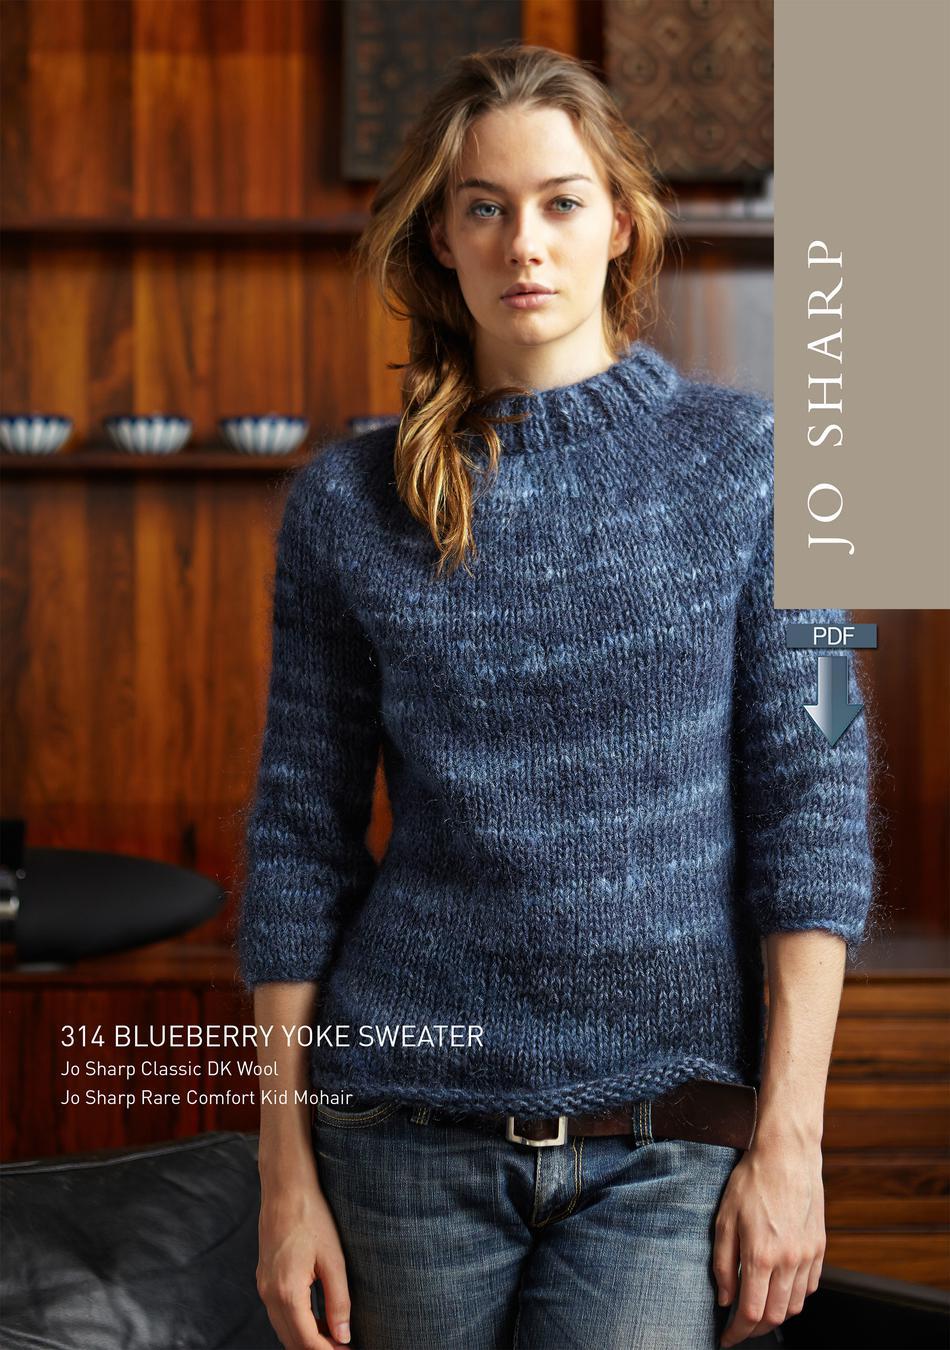 Jo sharp blueberry yoke sweater pattern pattern download knitting patterns jo sharp blueberry yoke sweater pattern pattern download bankloansurffo Images